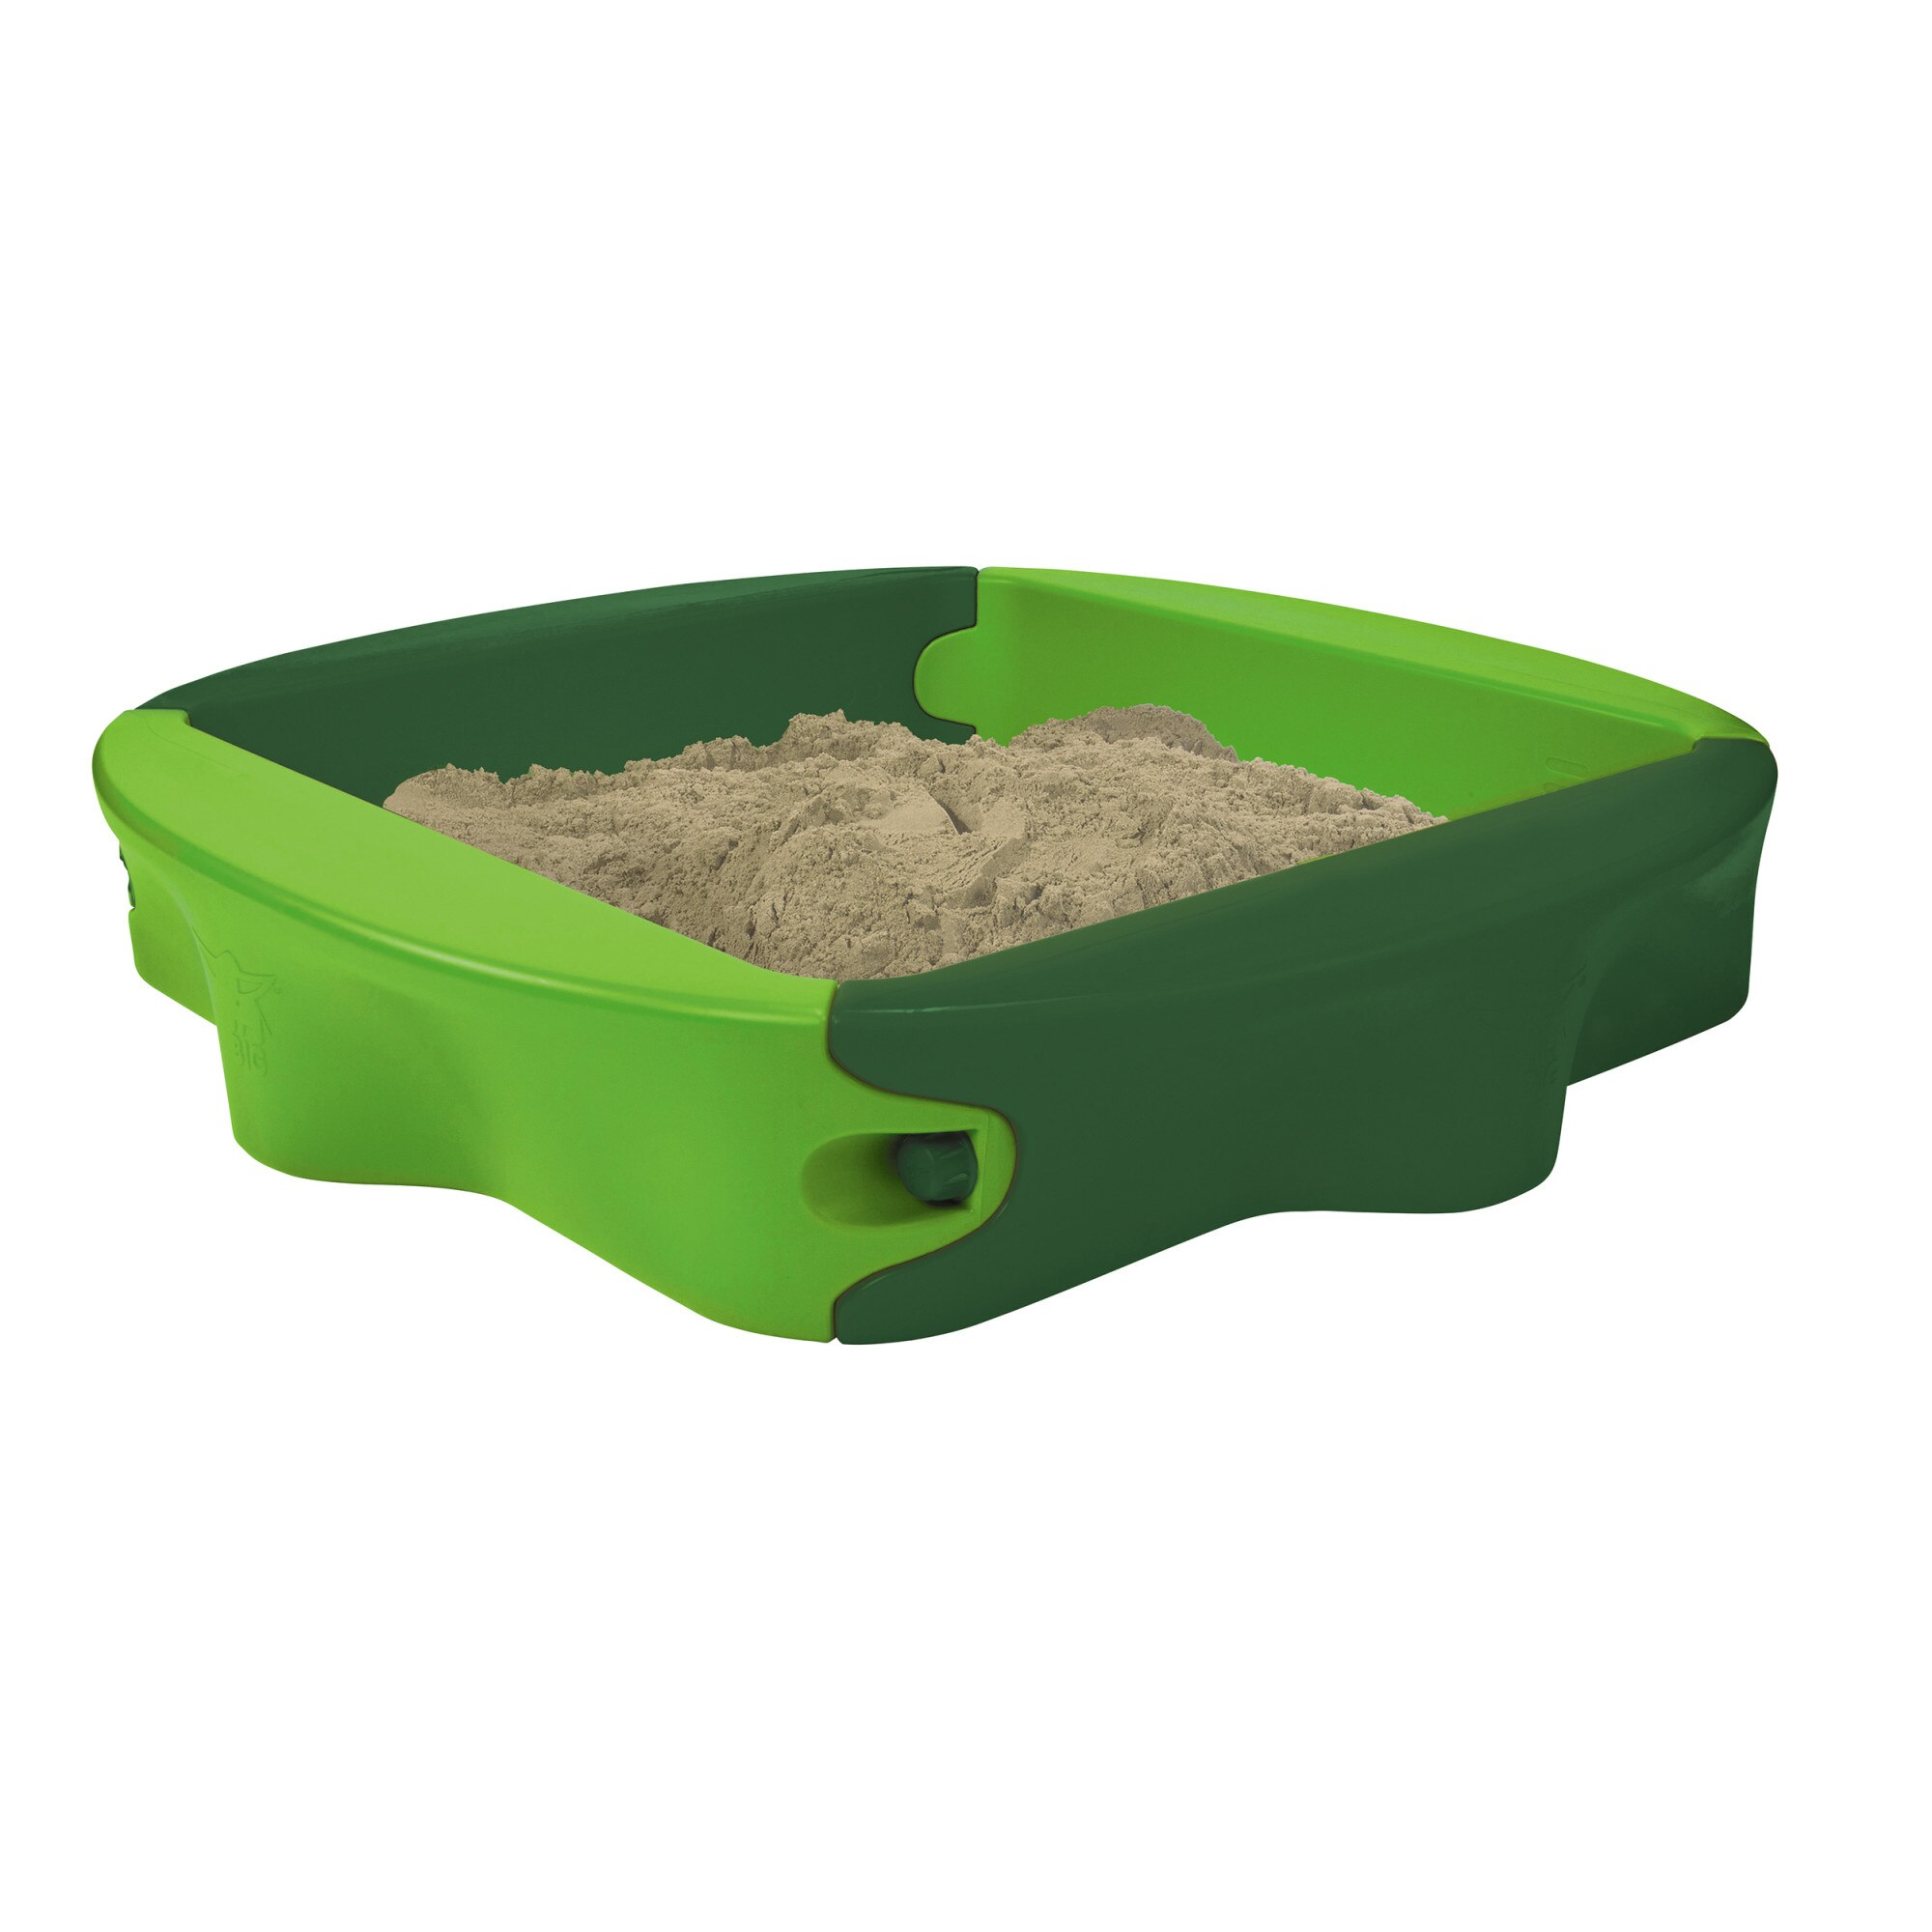 Fotografie Spatiu de joaca pentru nisip BBI - Sandy, cu capac, Verde, 138 x 138 x 24 cm